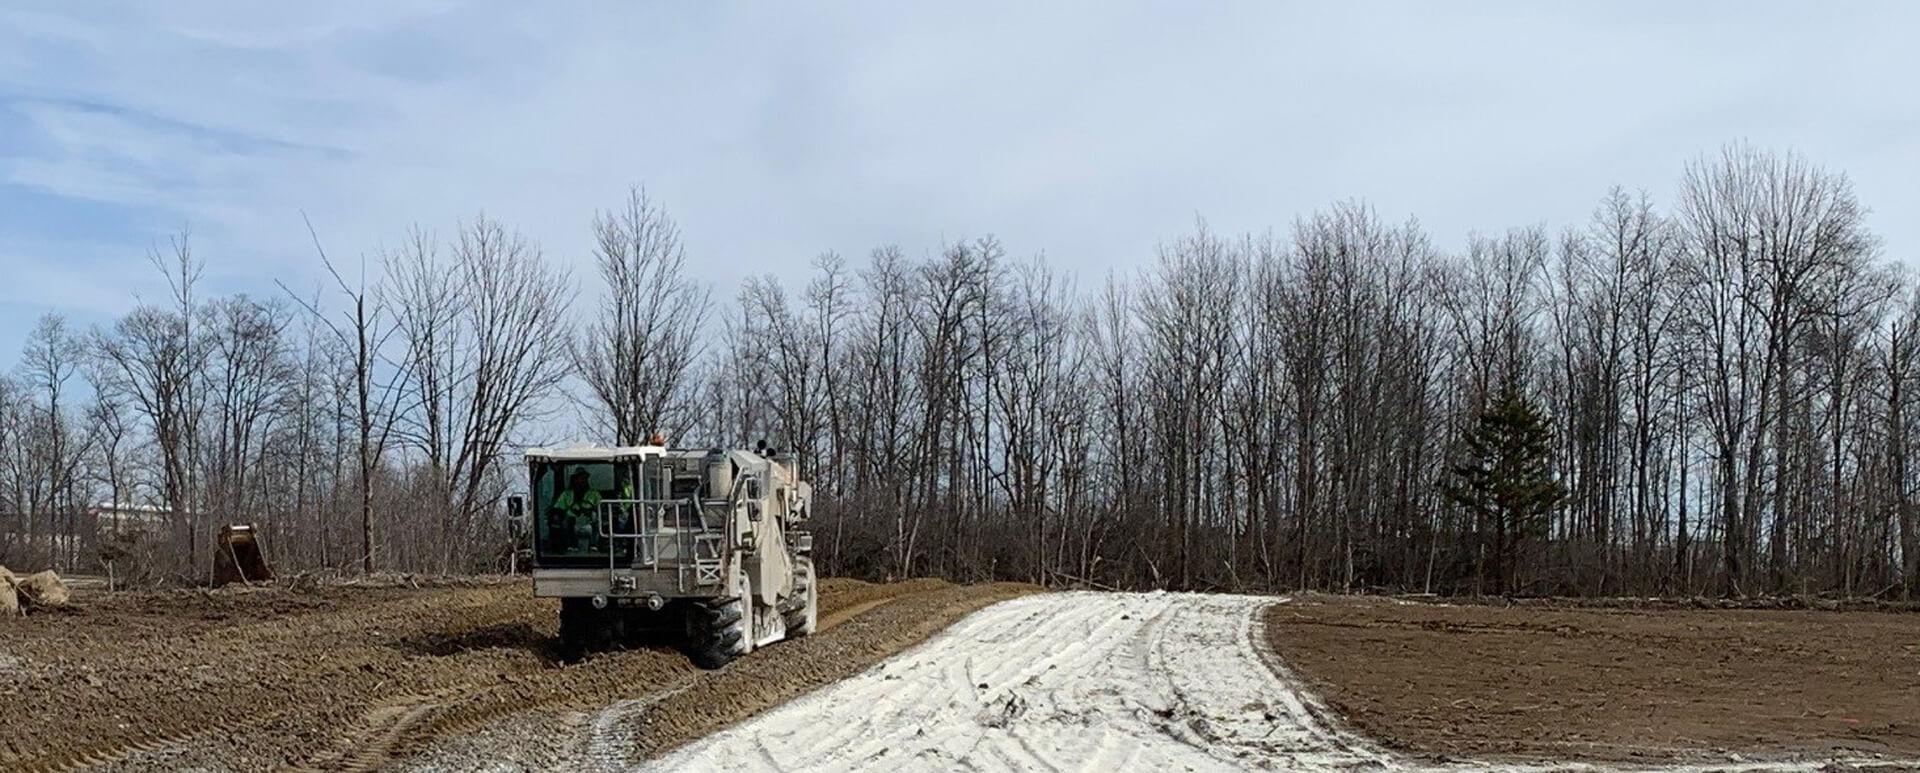 Machine laying lime on soil